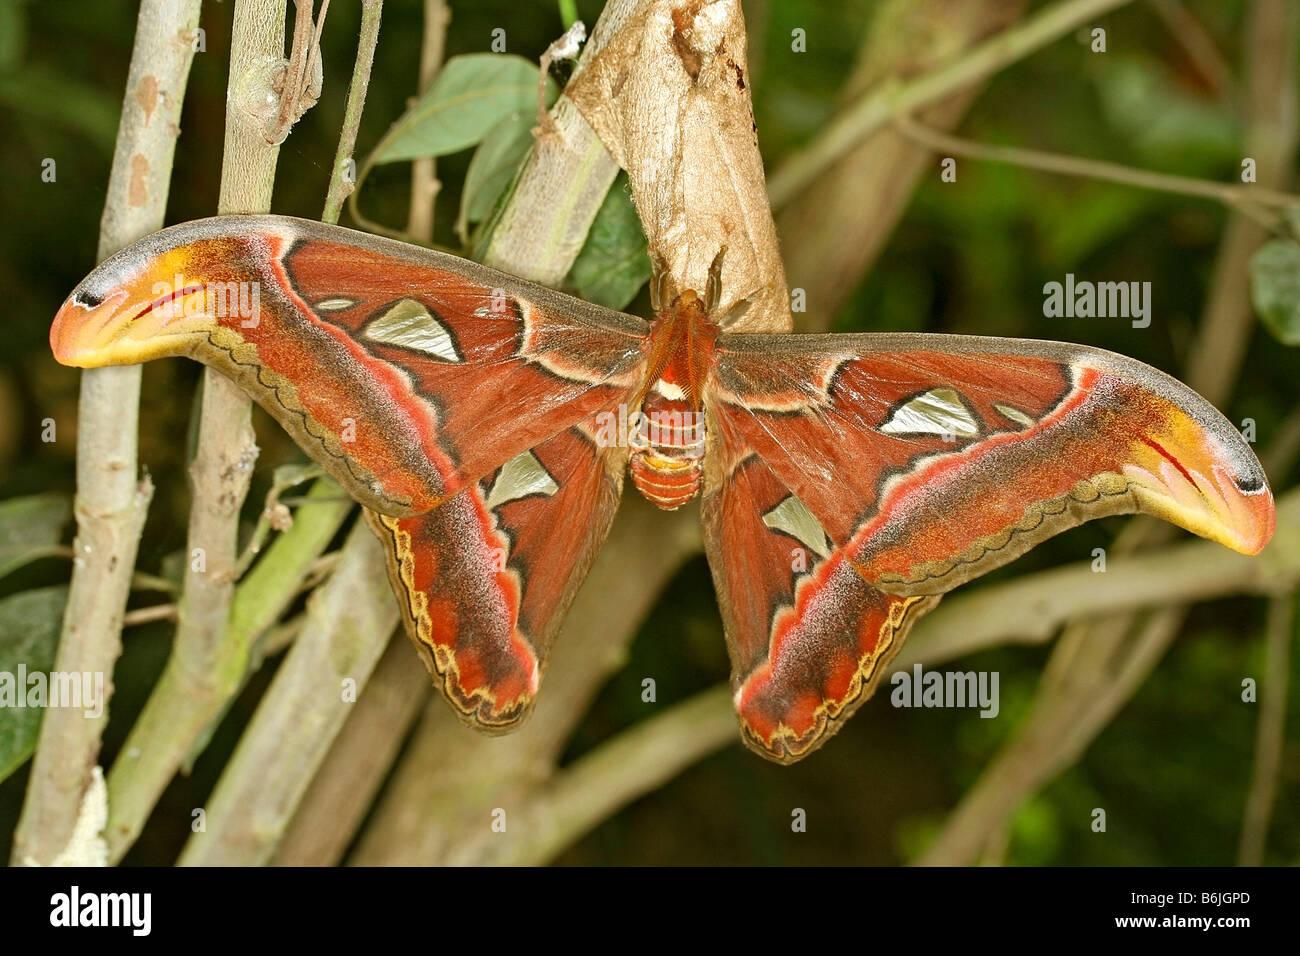 Atlas moth Attacus atlas - Stock Image